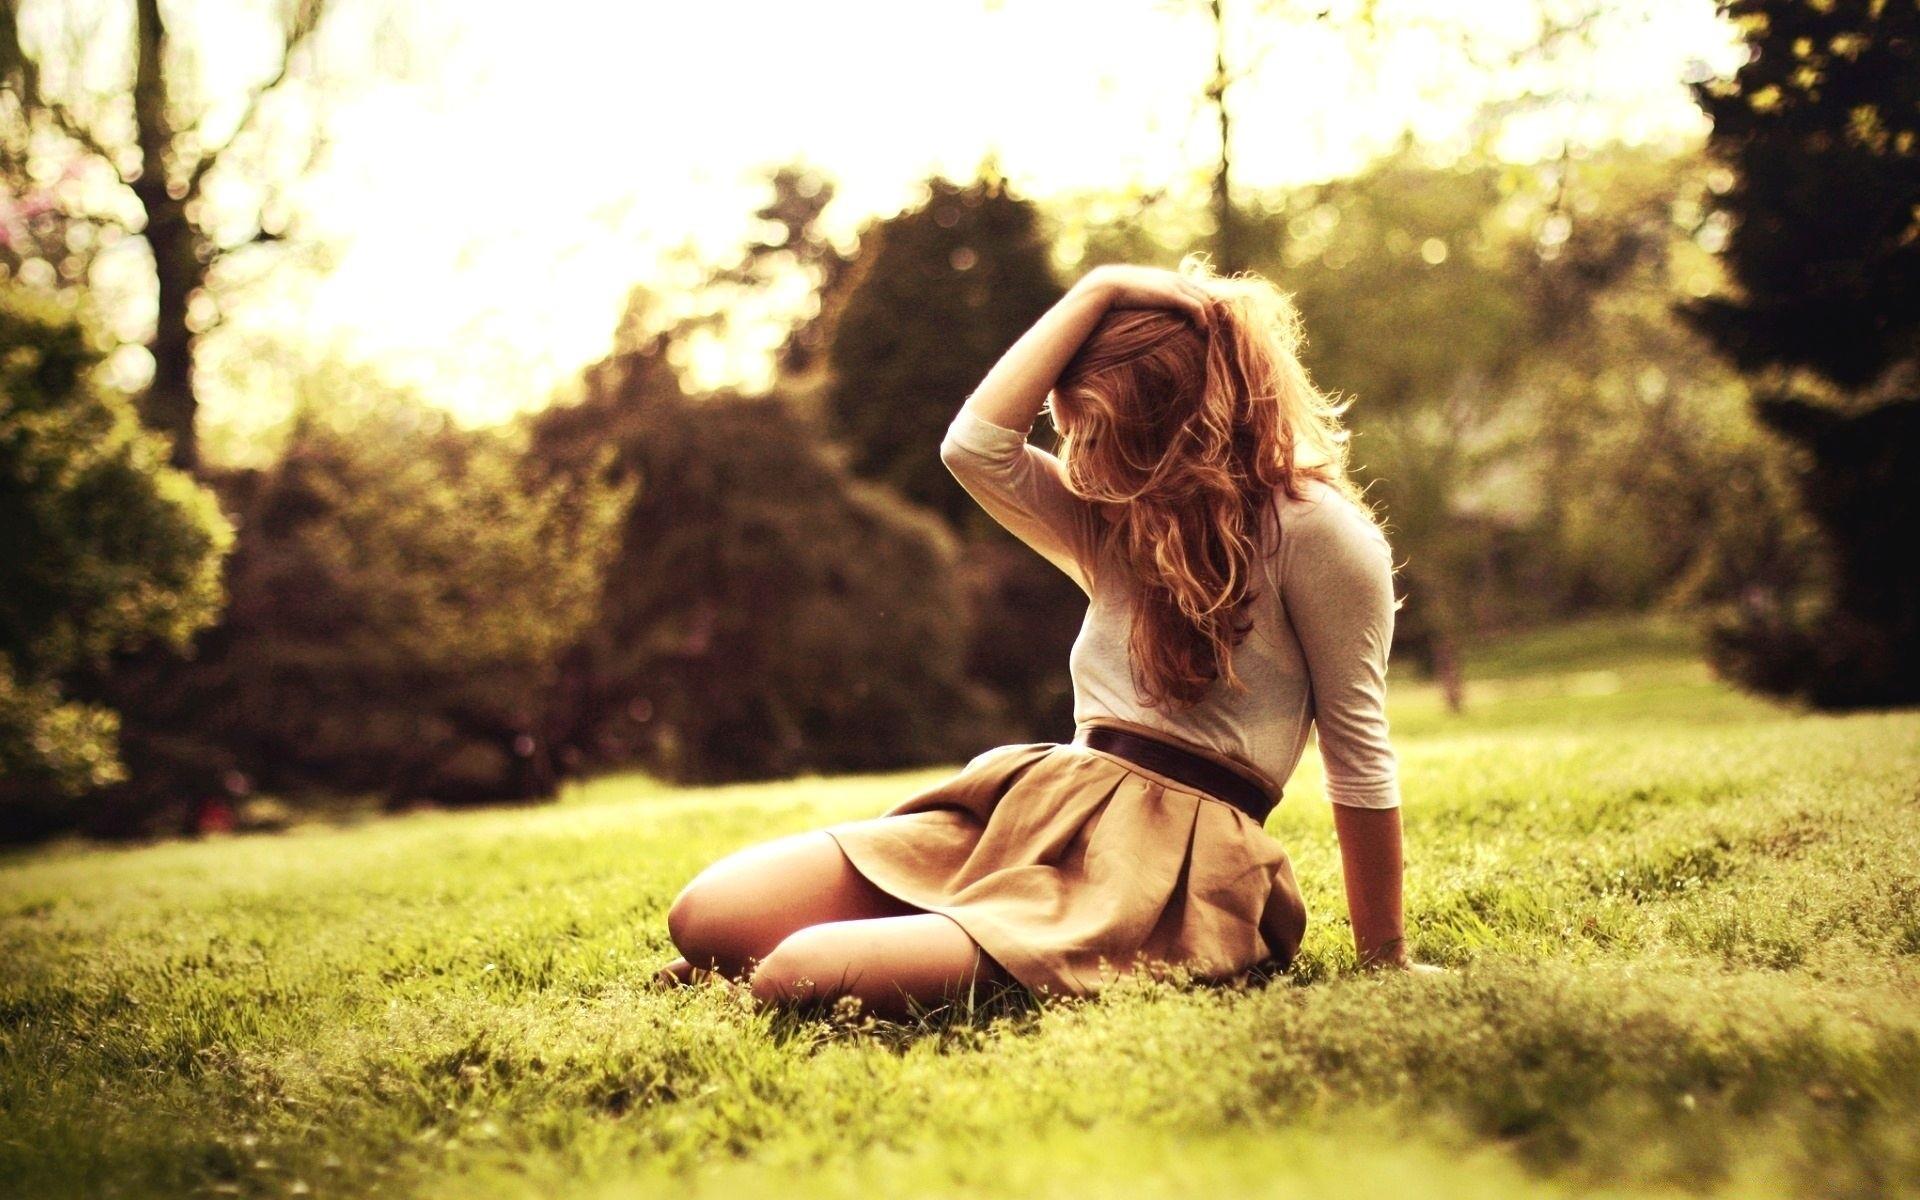 Фото на природе девушек на аву в